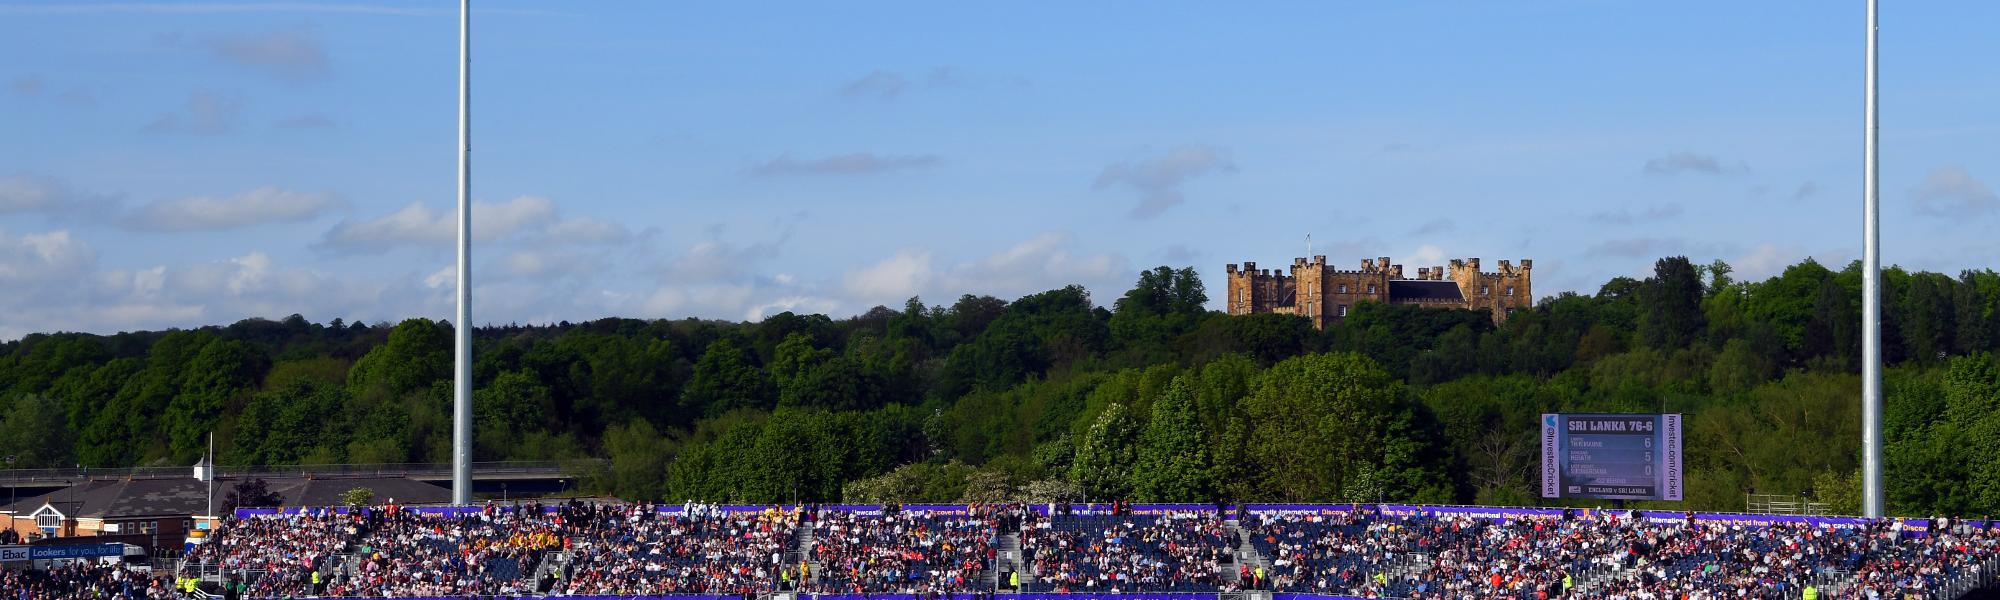 The Riverside Durham